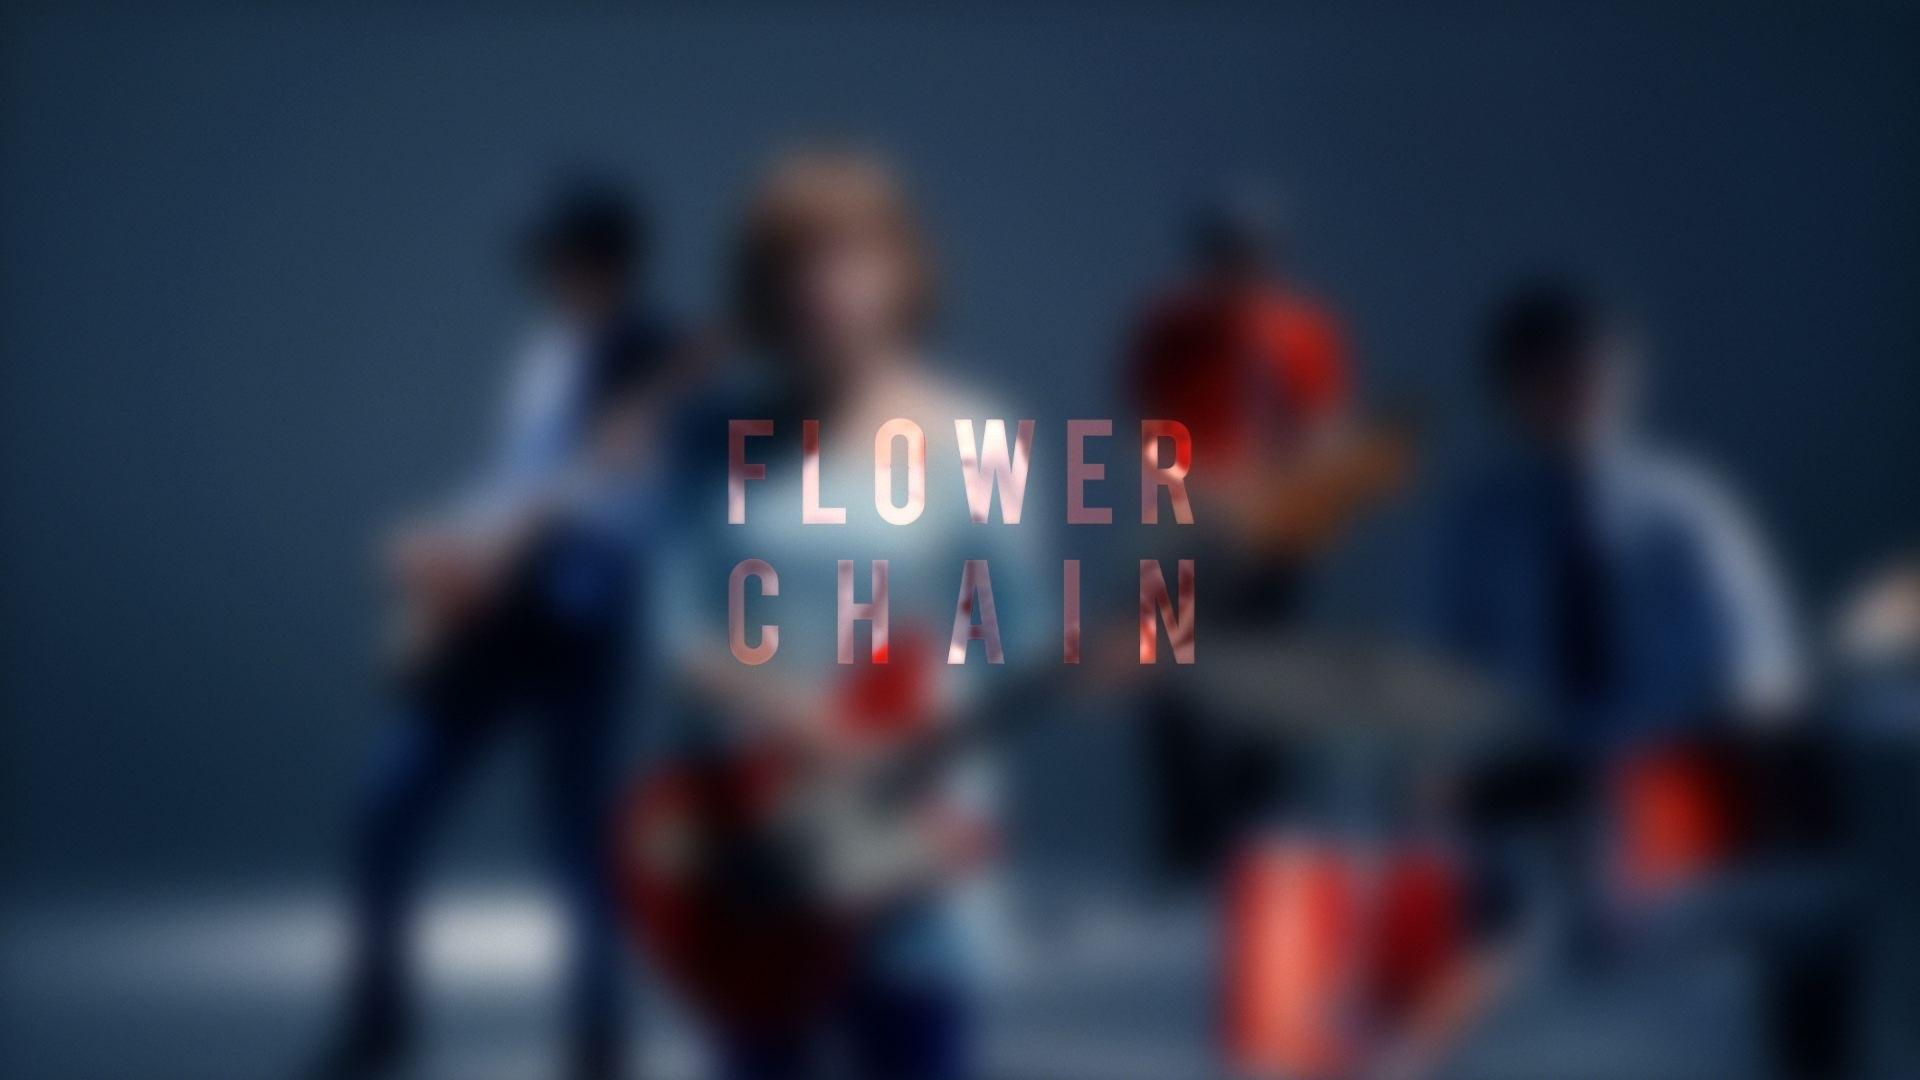 parallel_taffy_flower_chain_jxf4b.jpg